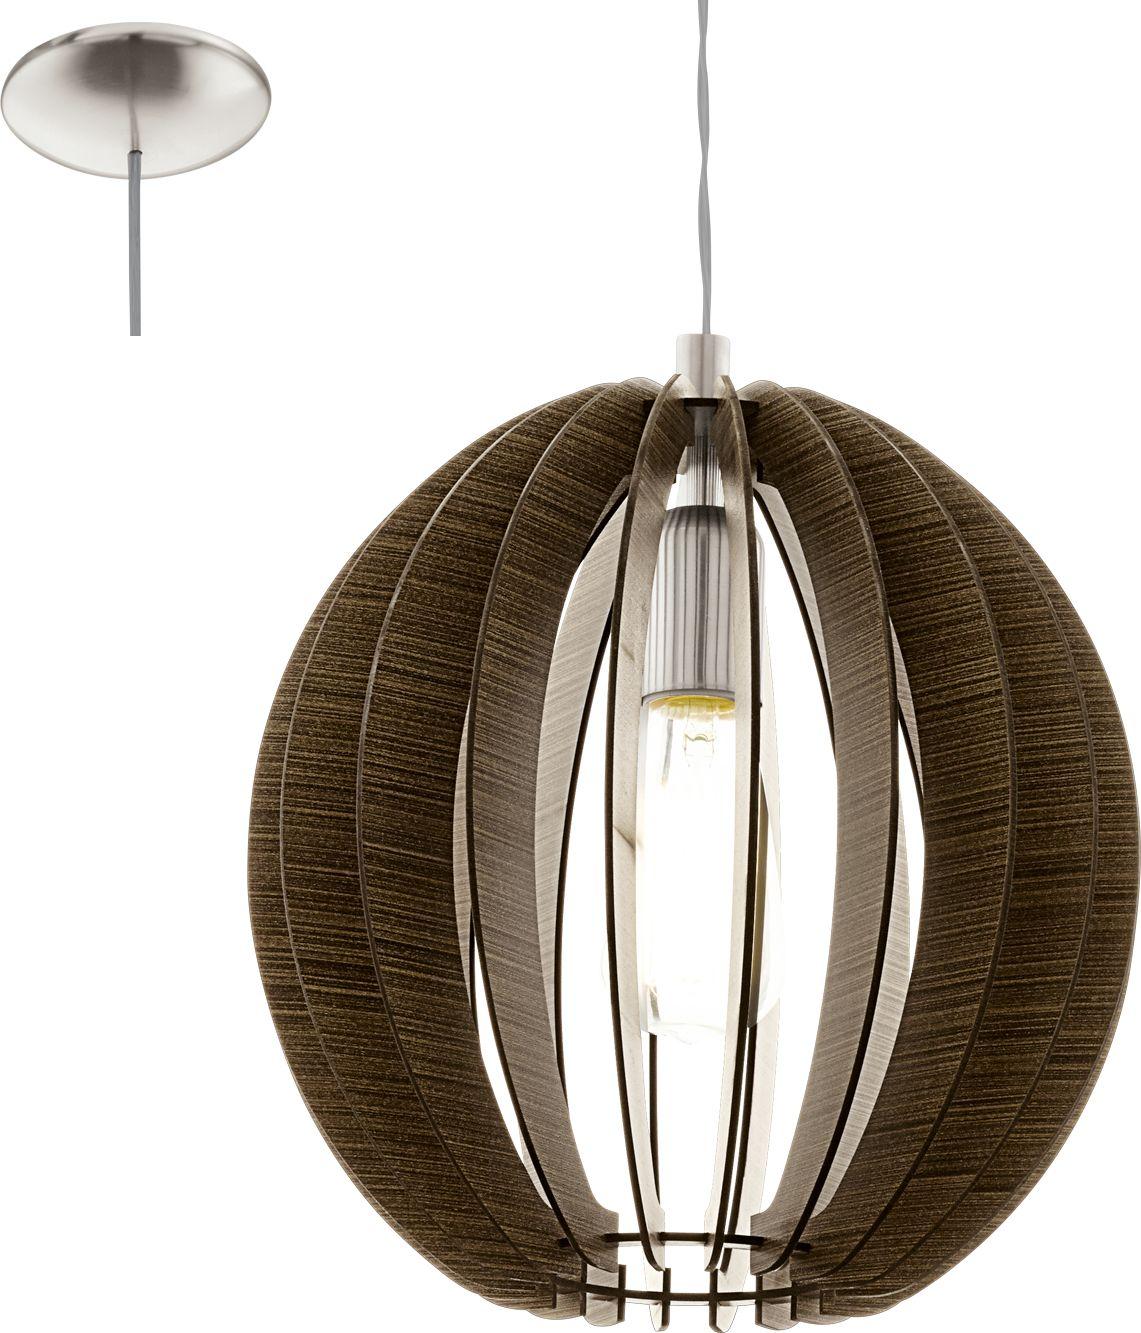 Eglo lampa wisząca Cossano 94635 - SUPER OFERTA - RABAT w koszyku